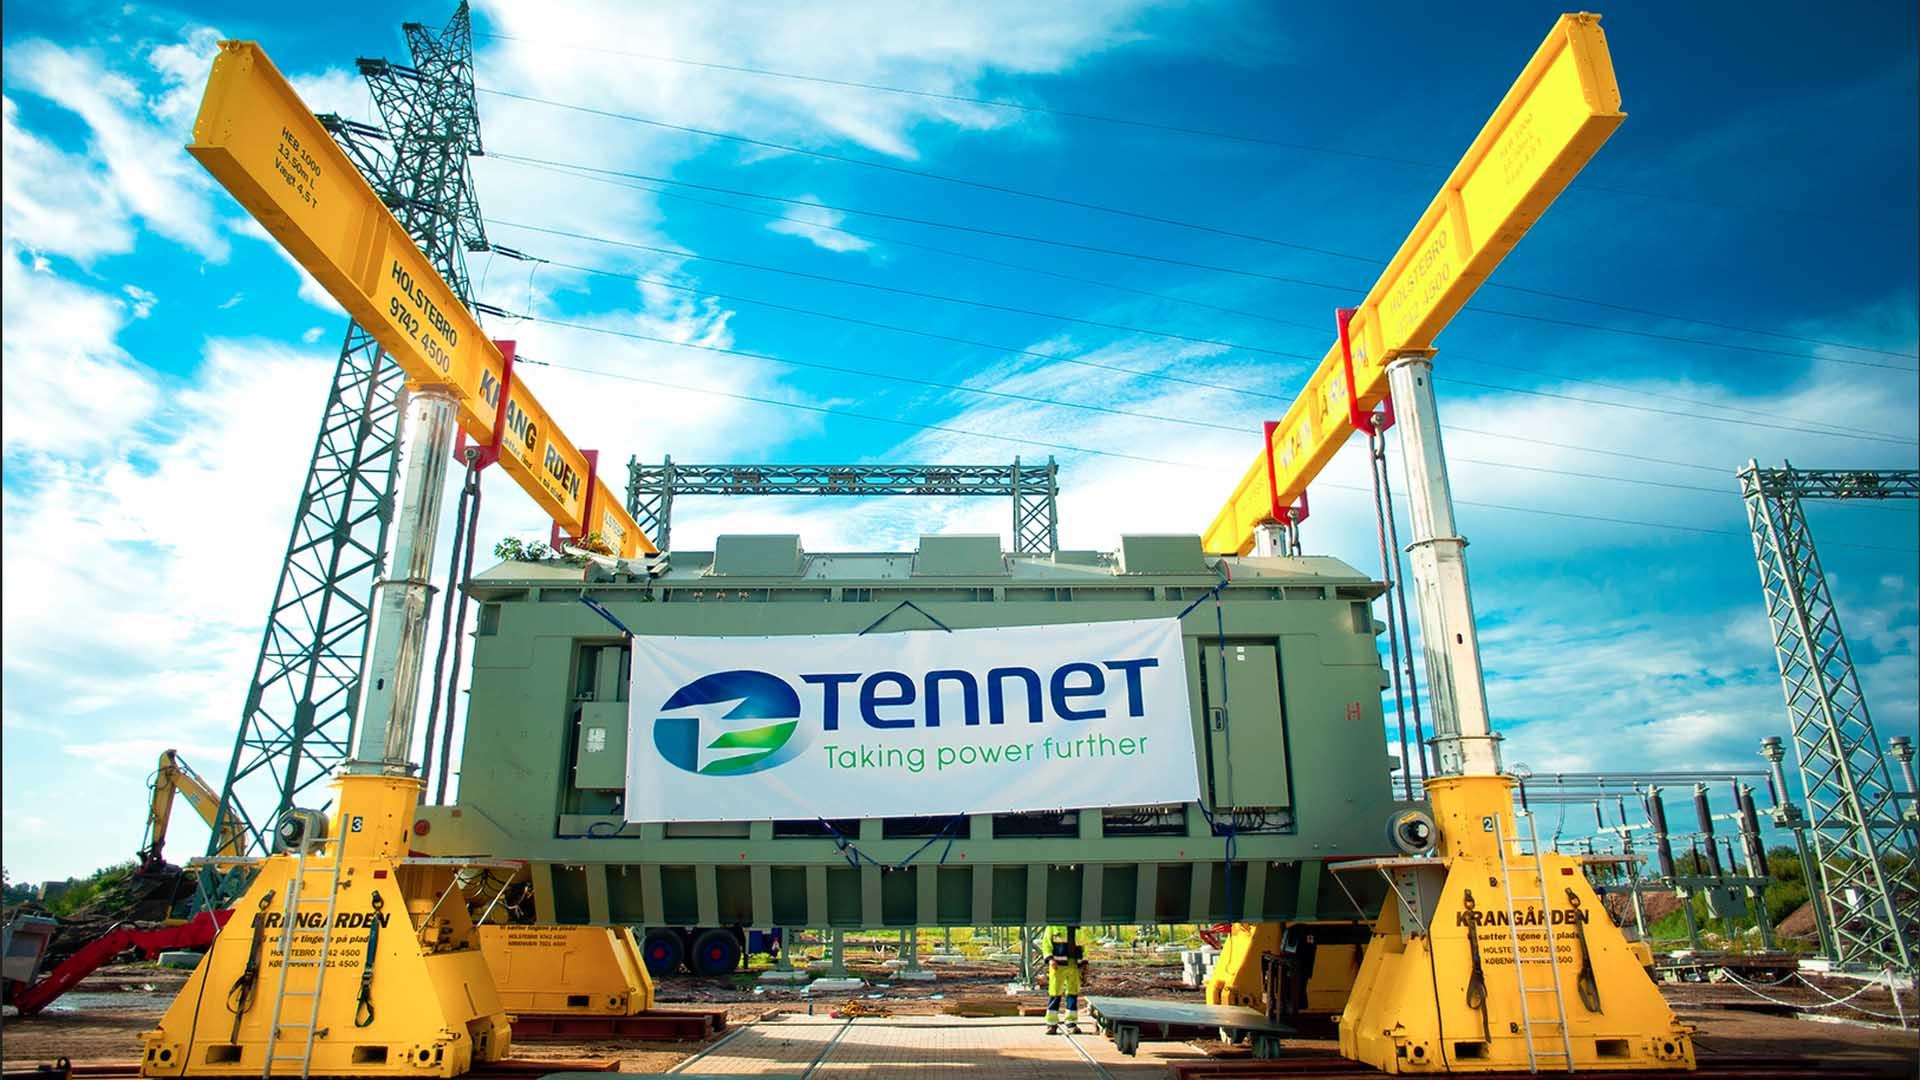 Modernisation of Pleinting substation